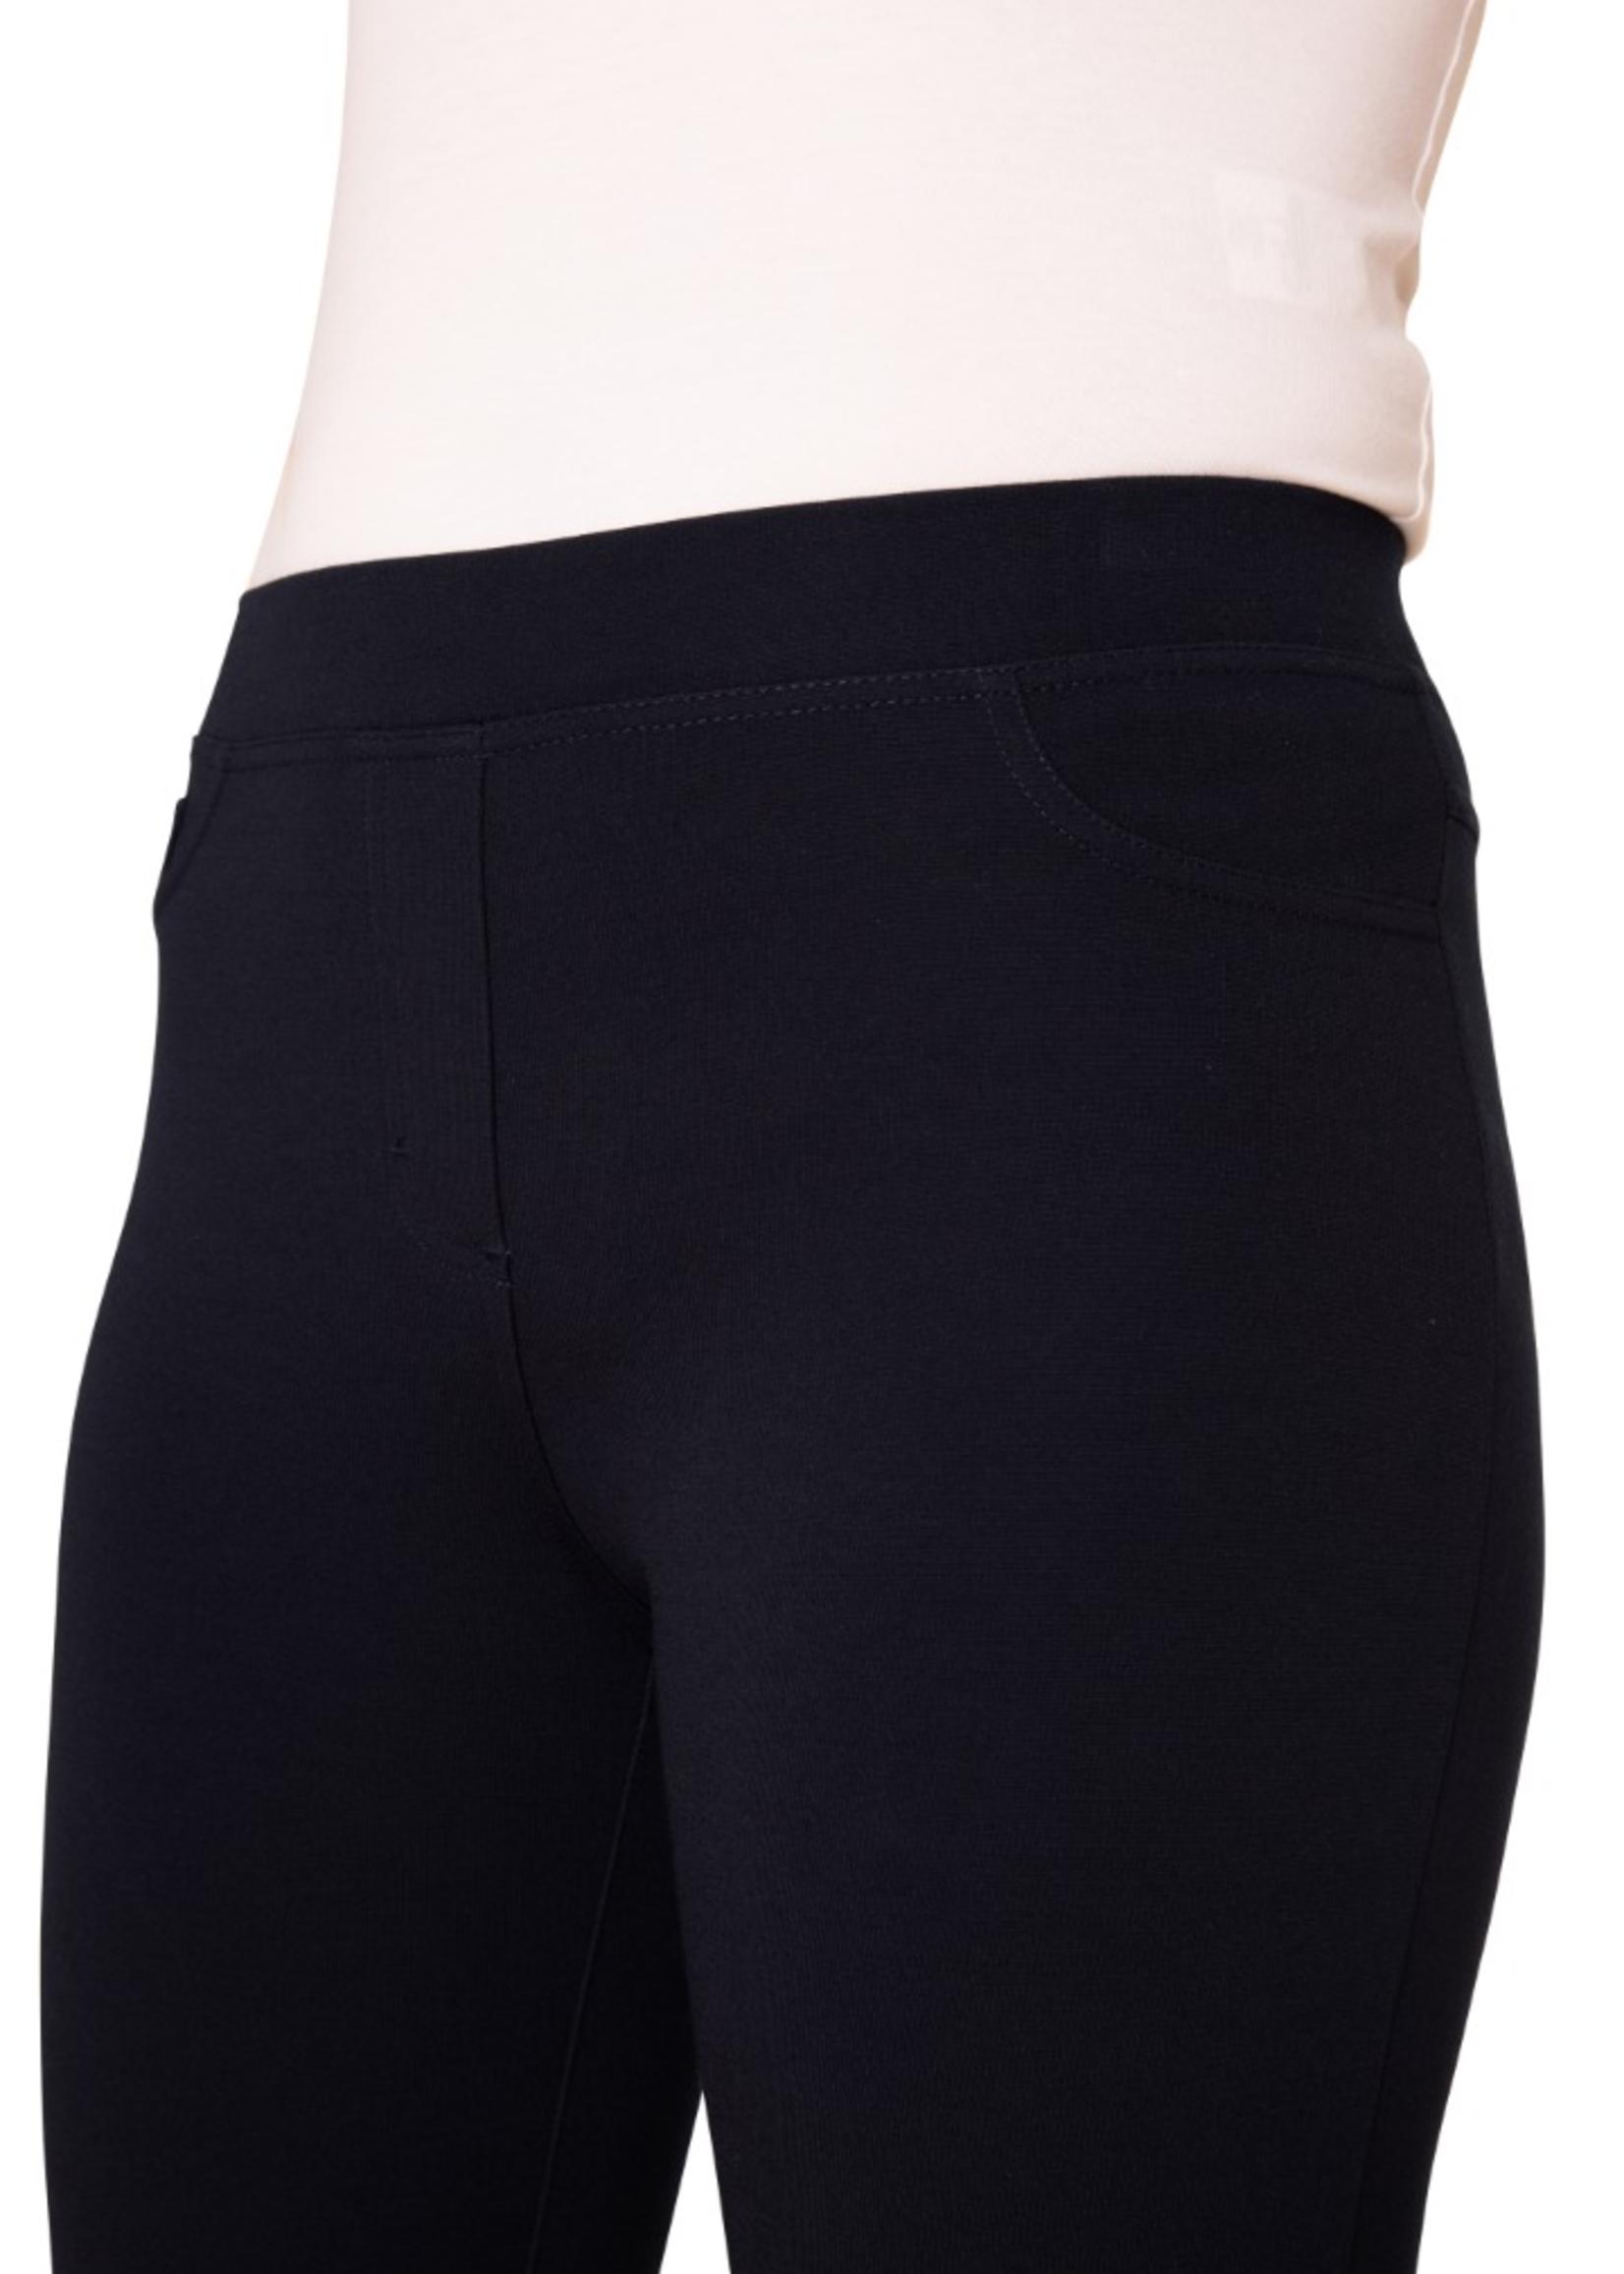 Yest Yest Ornika Pants